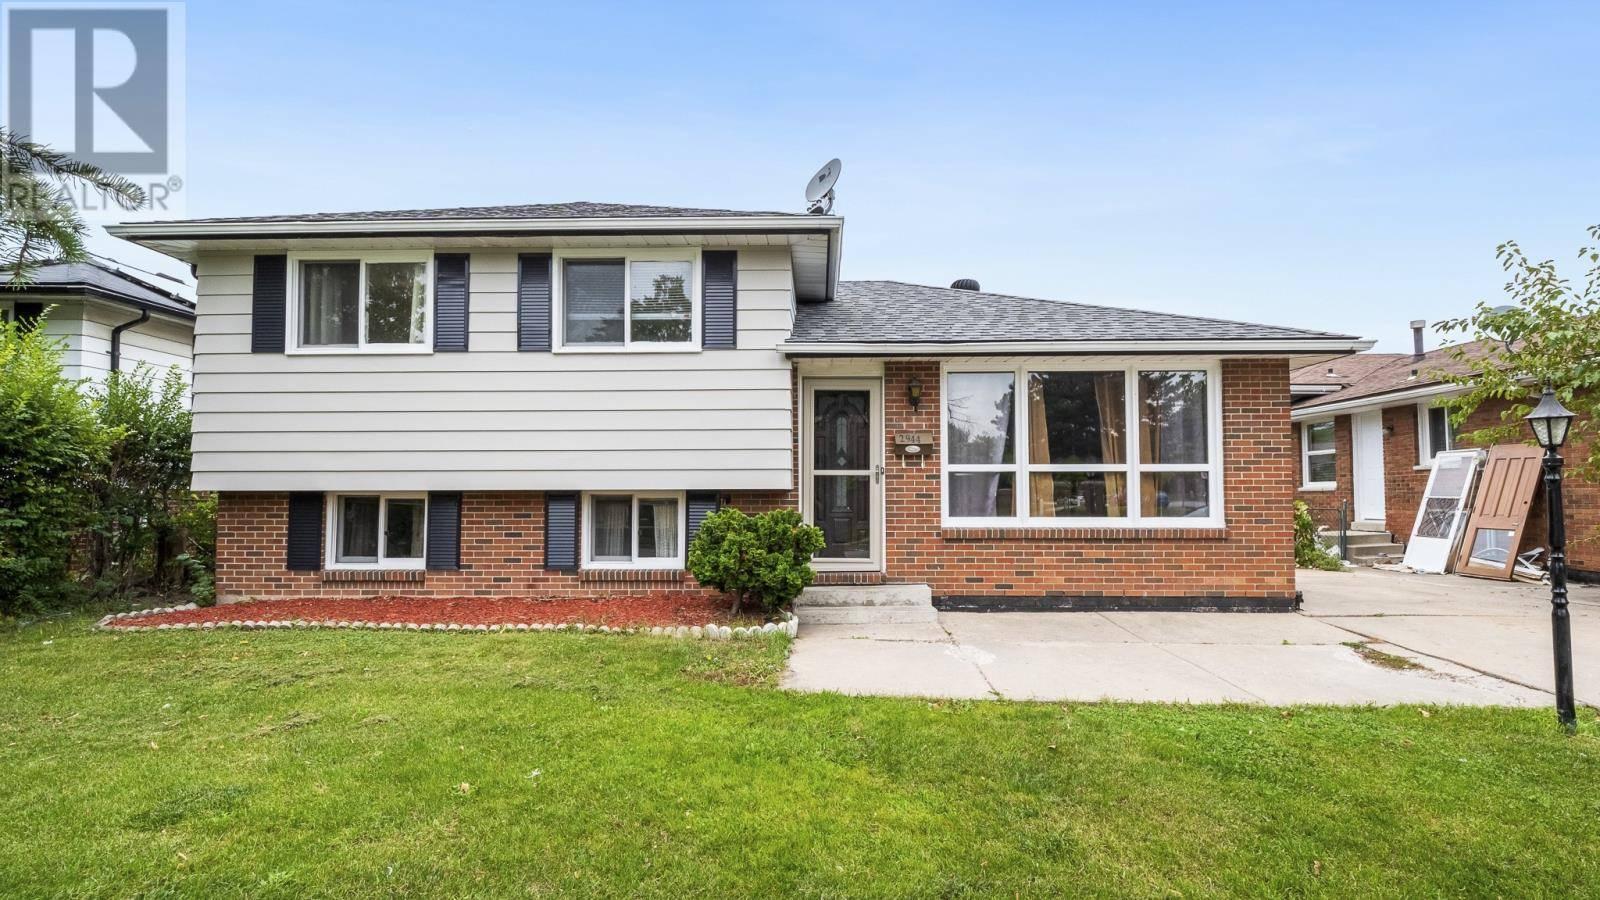 House for sale at 2944 Grandview  Windsor Ontario - MLS: 19026909